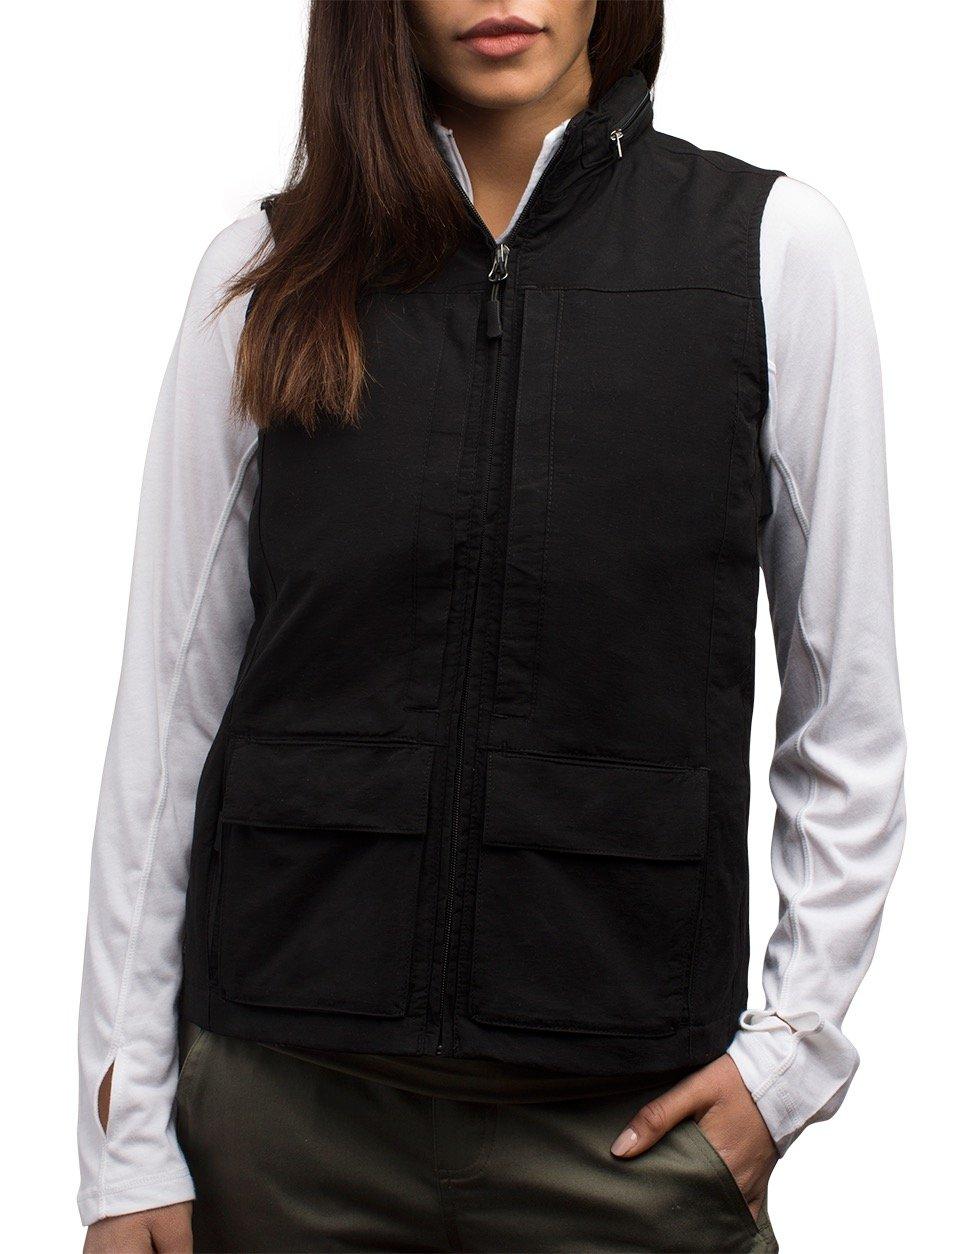 SCOTTeVEST Women's Q.U.E.S.T. Vest - 42 Pockets – Photography, Travel Vest M2